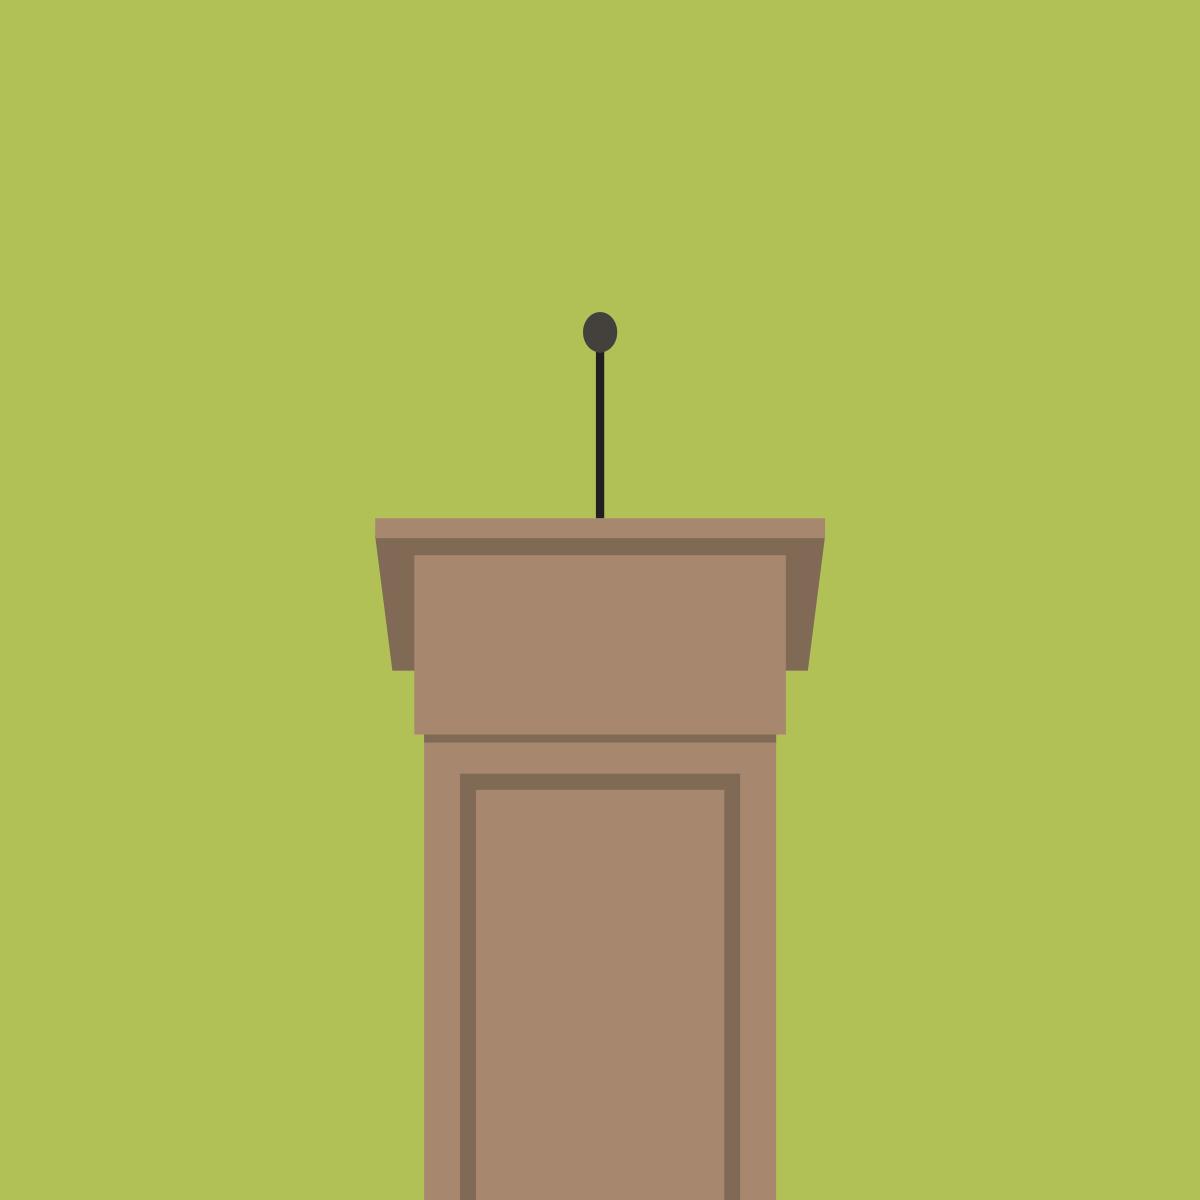 124 language of presenting